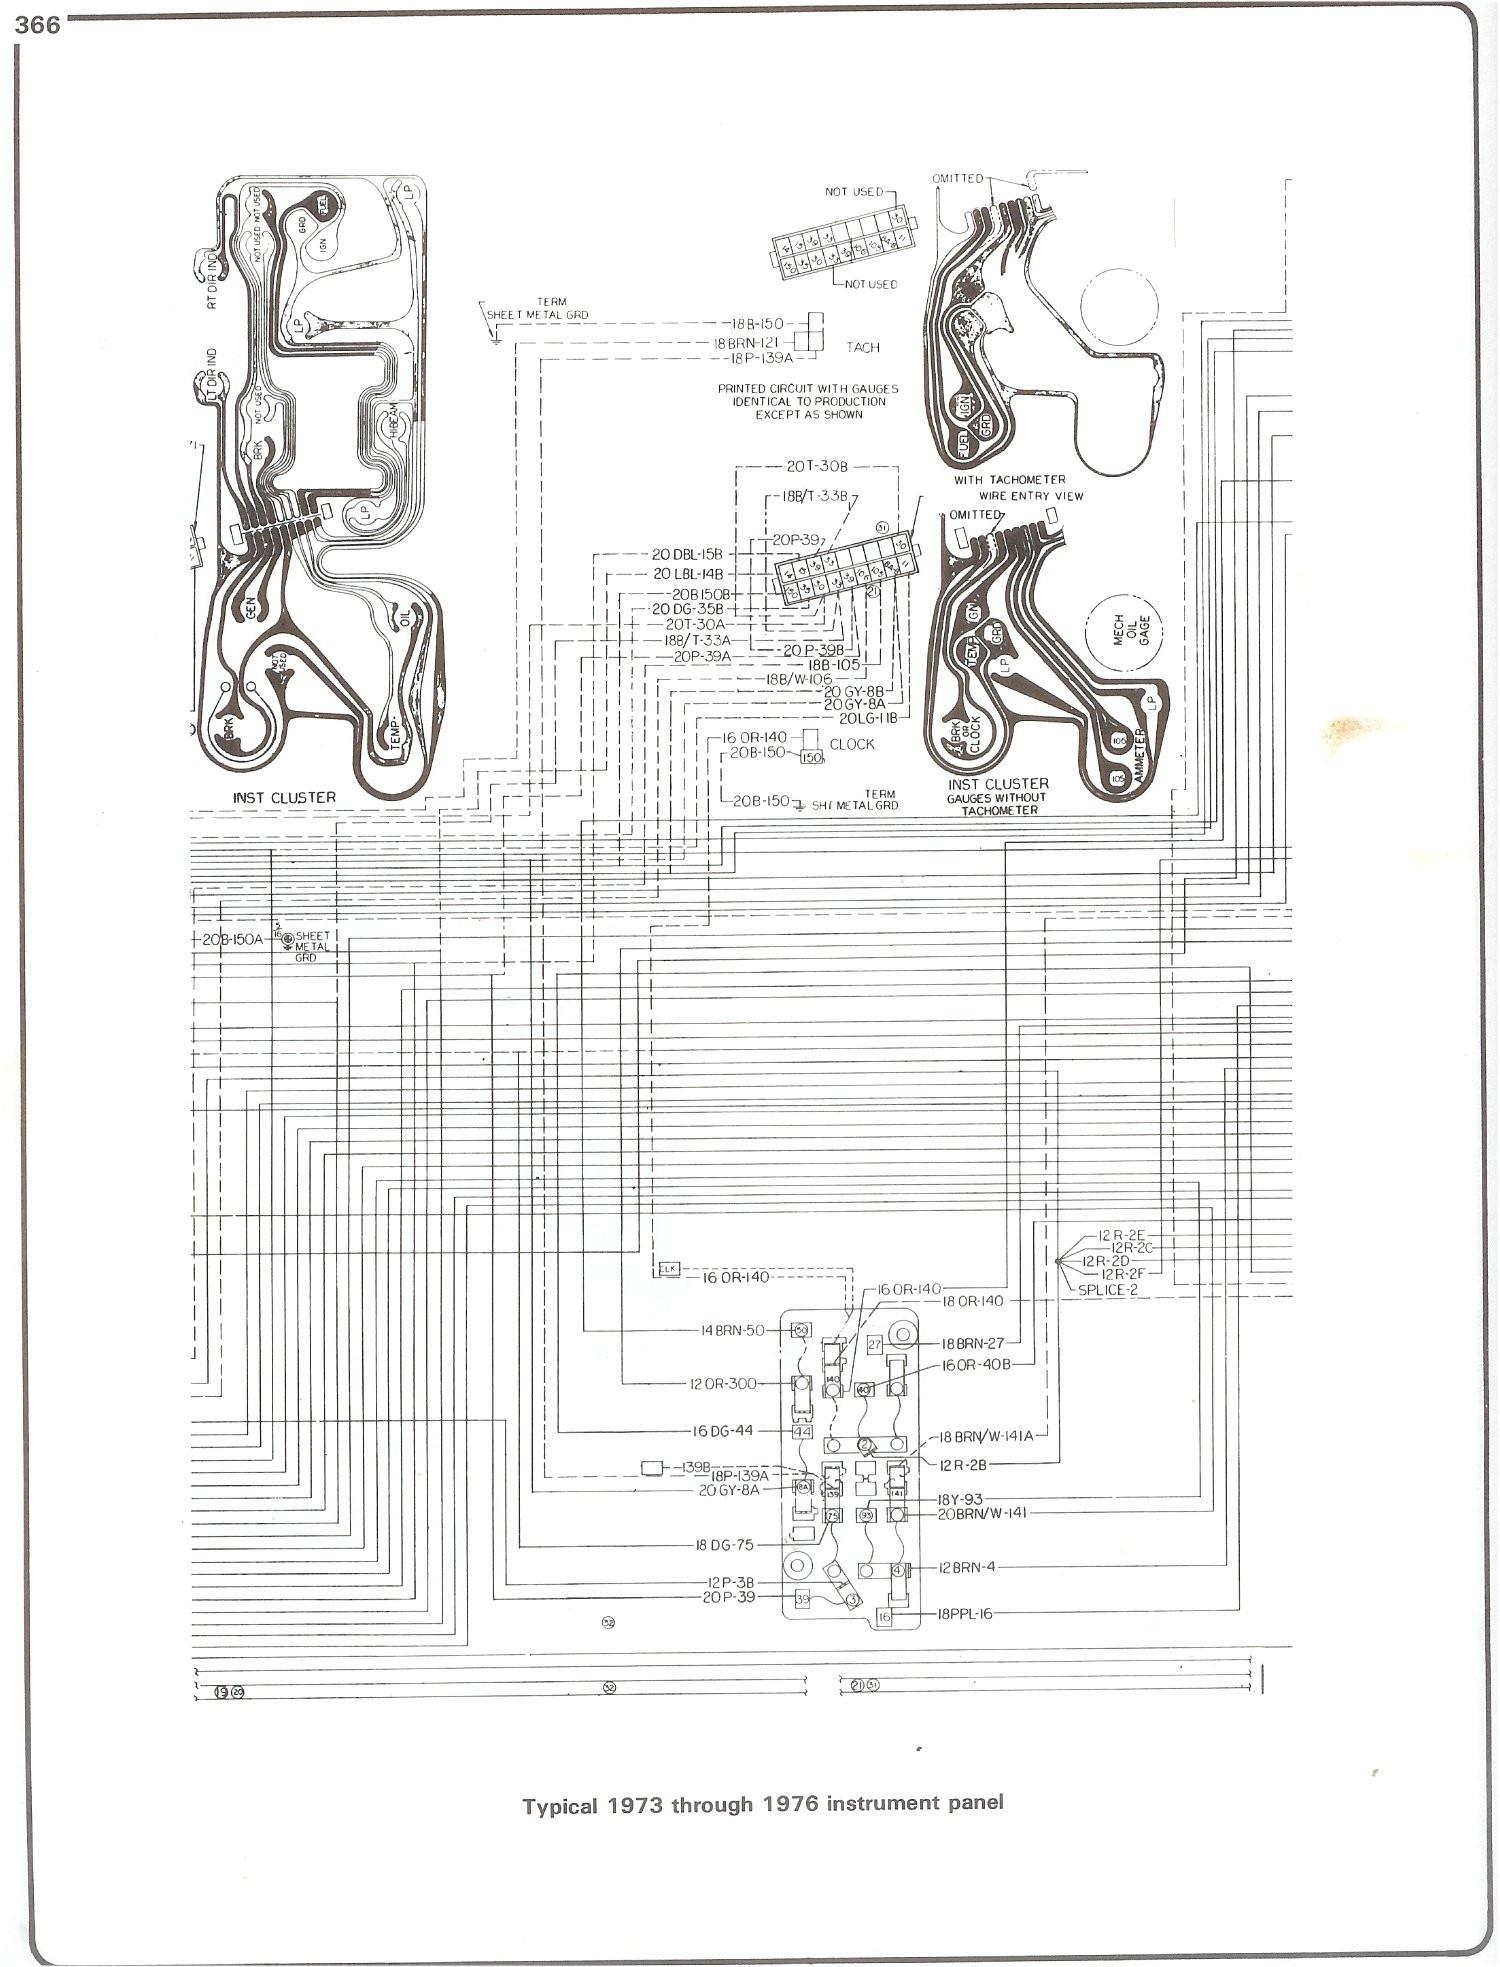 2018 Chevy 1/2 Ton Unique Warn Winch Wiring Diagram 4 Solenoid - Warn Winch Wiring Diagram 4 Solenoid